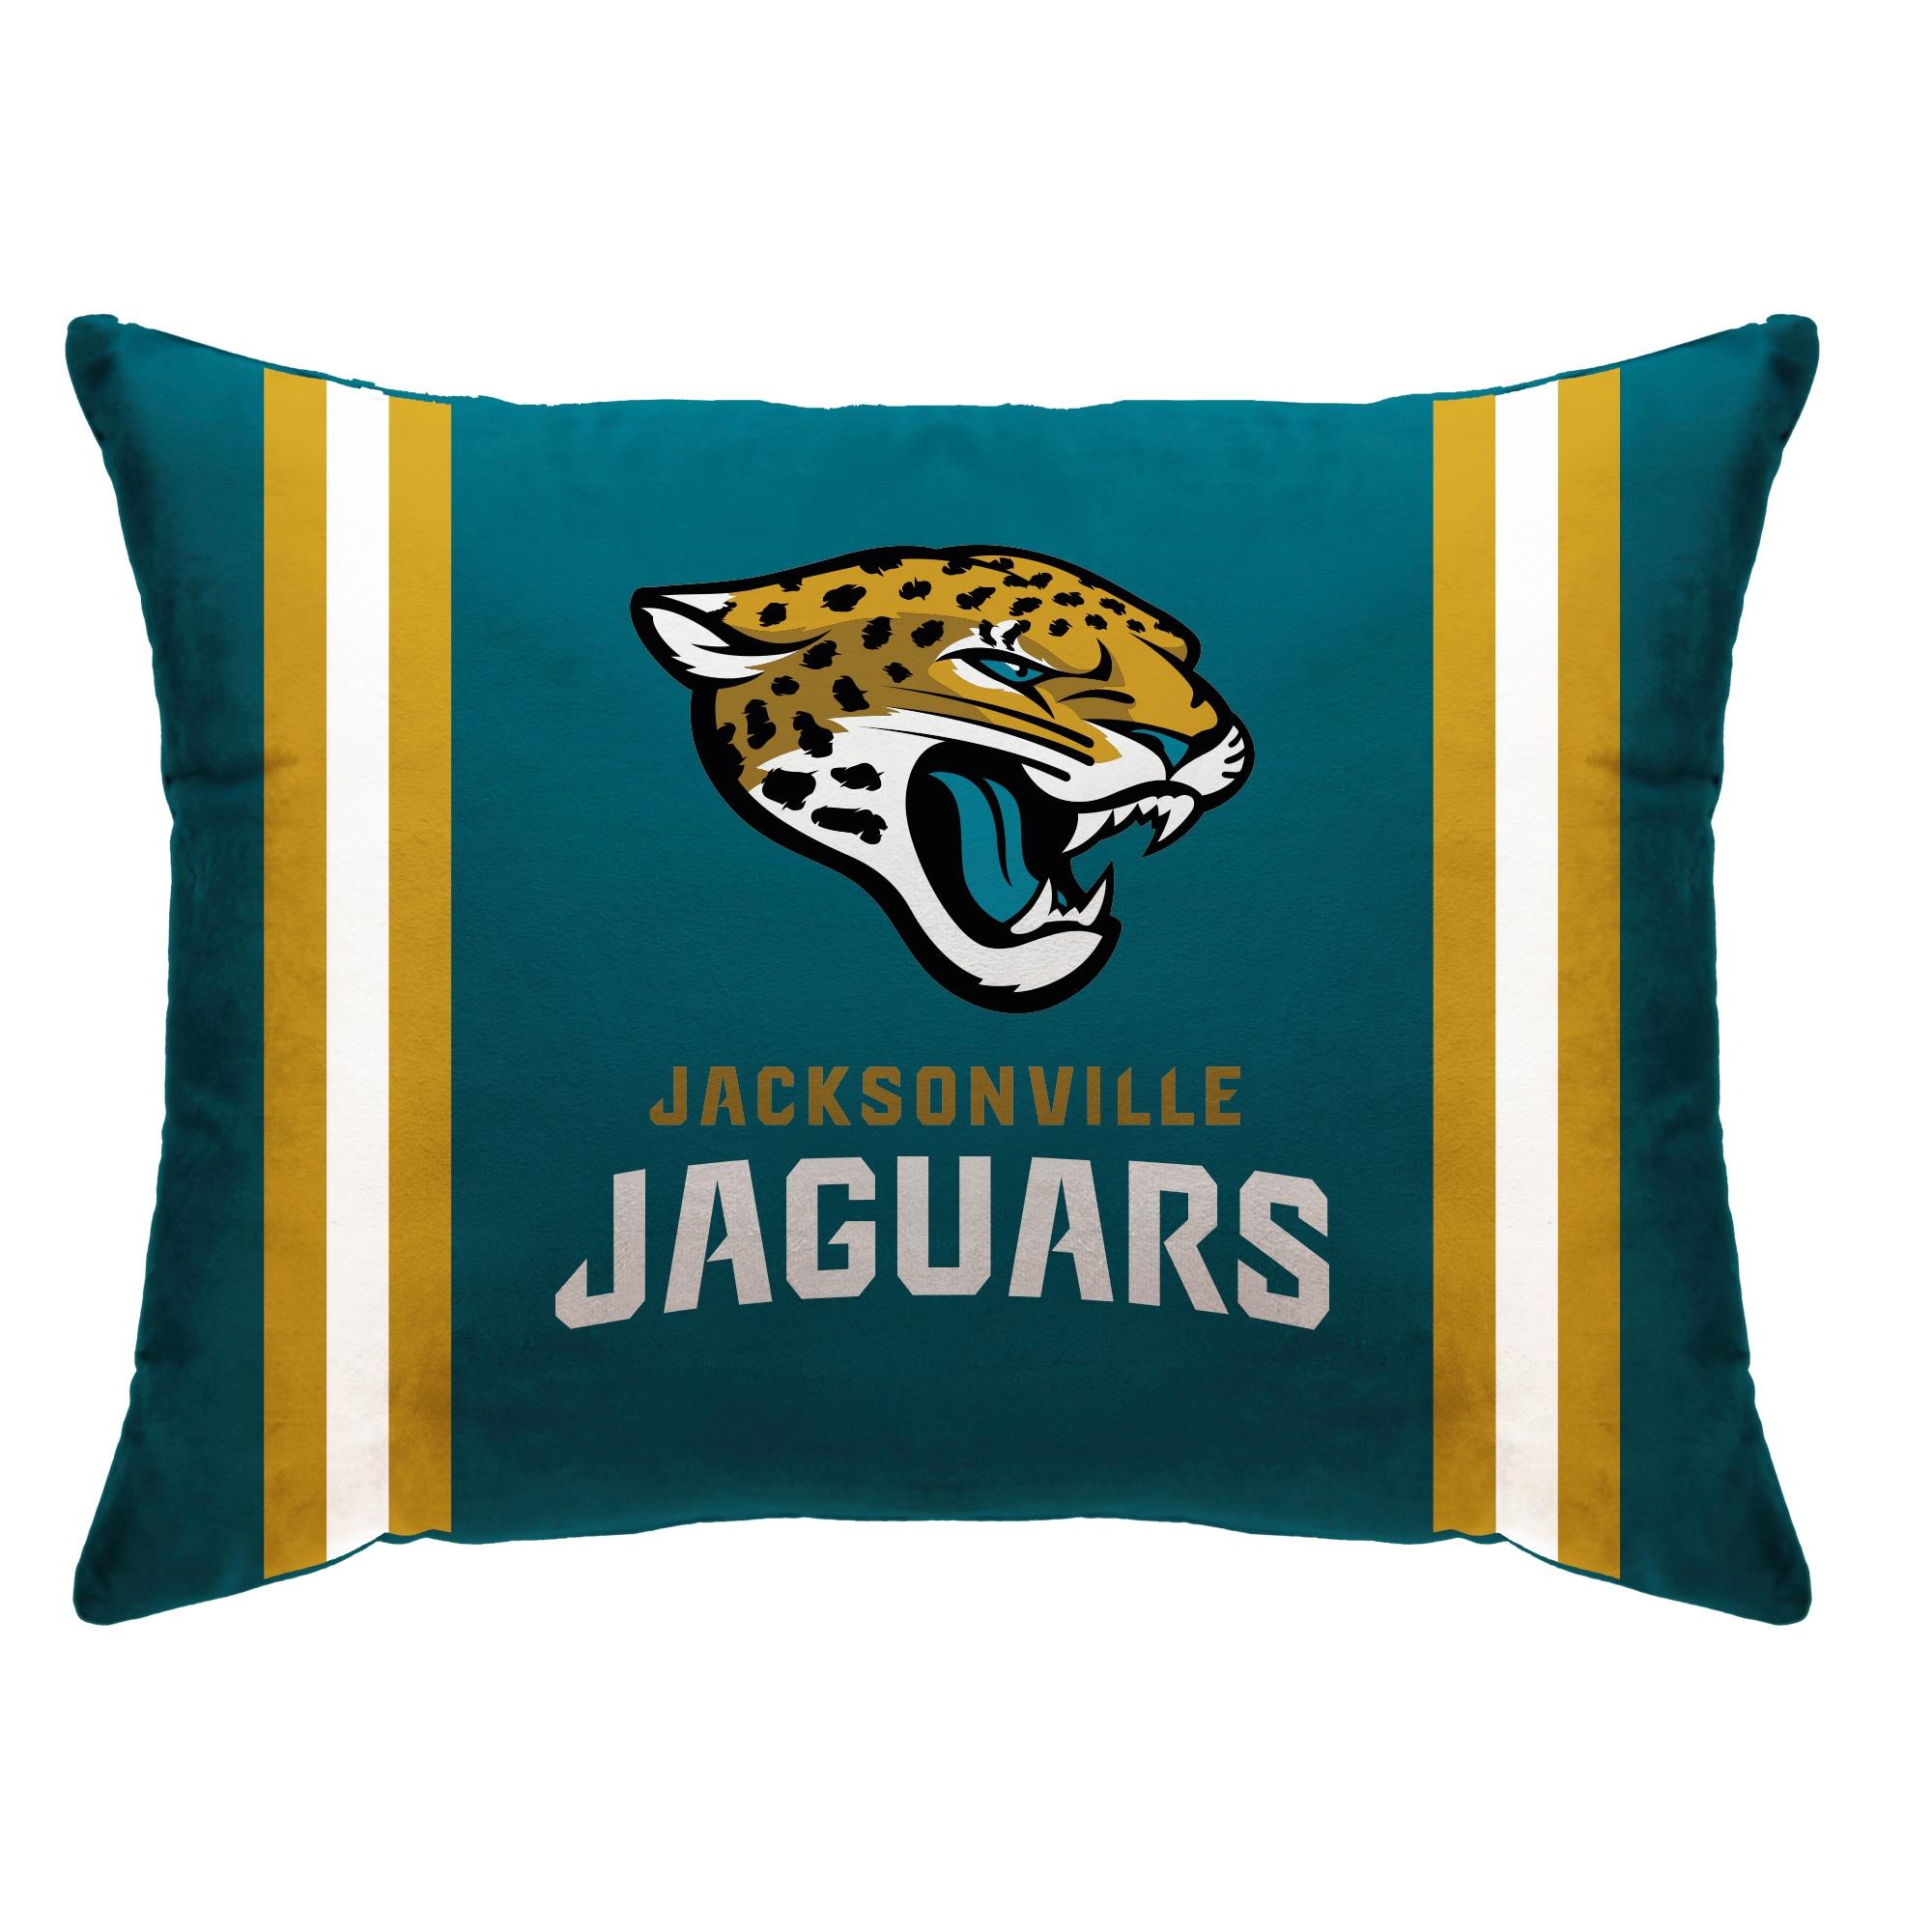 "Jacksonville Jaguars 20"" x 26"" Plush Bed Pillow - Teal"